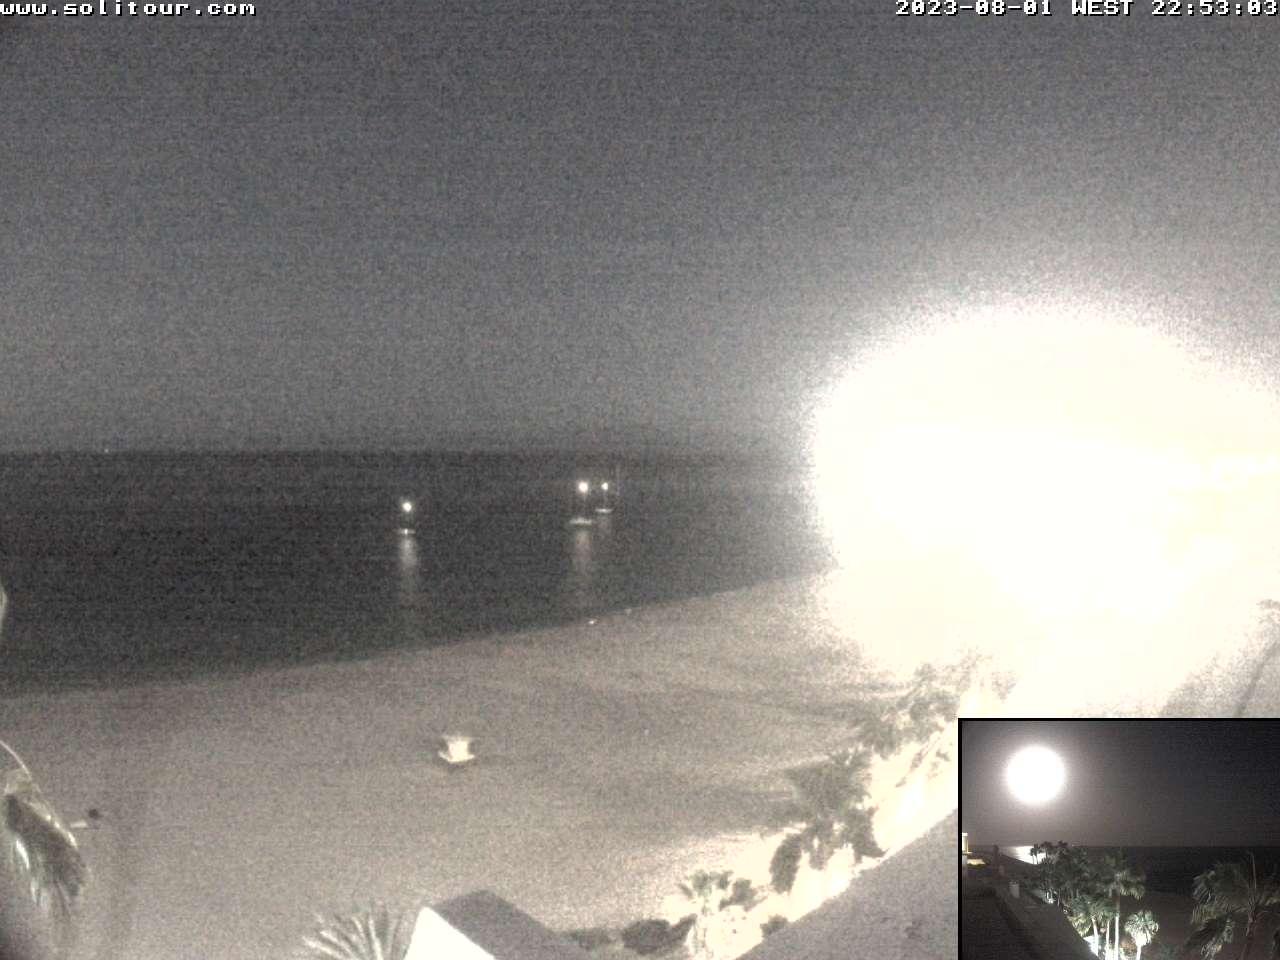 Jandia (Fuerteventura) Mon. 22:54